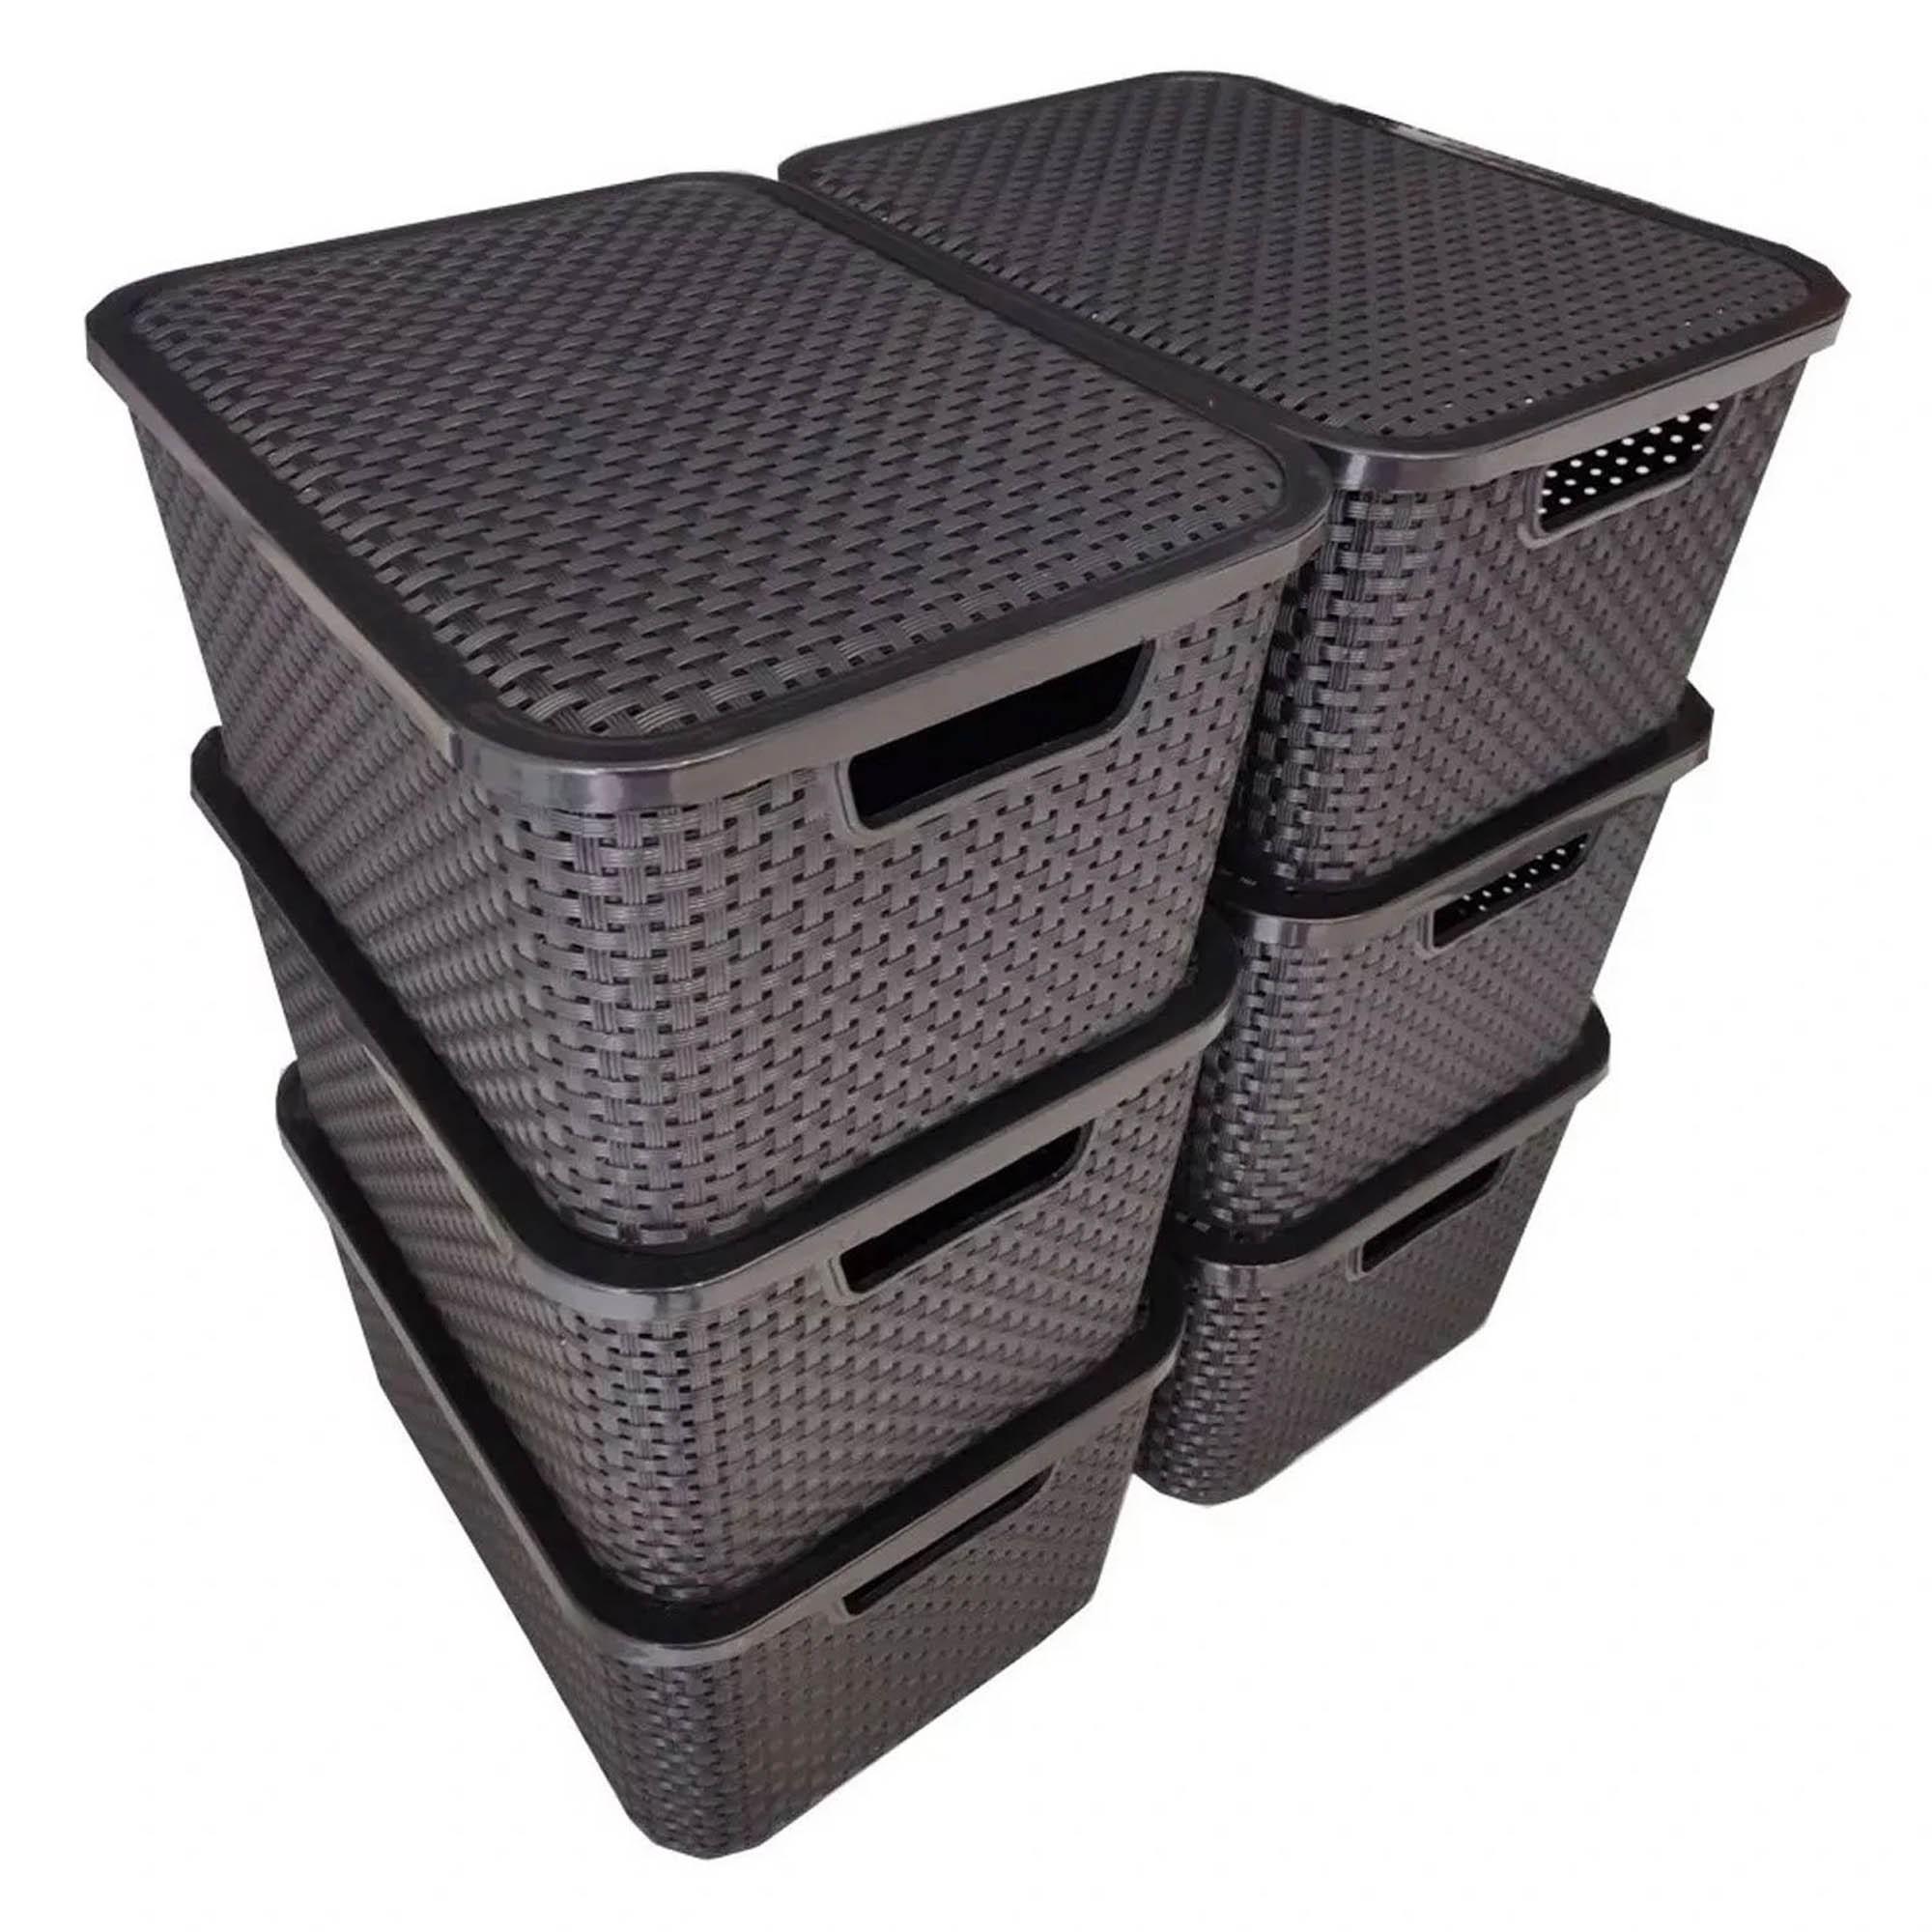 8 x Caixa Organizadora Plástica Cesto Rattan 15 L Com Tampa